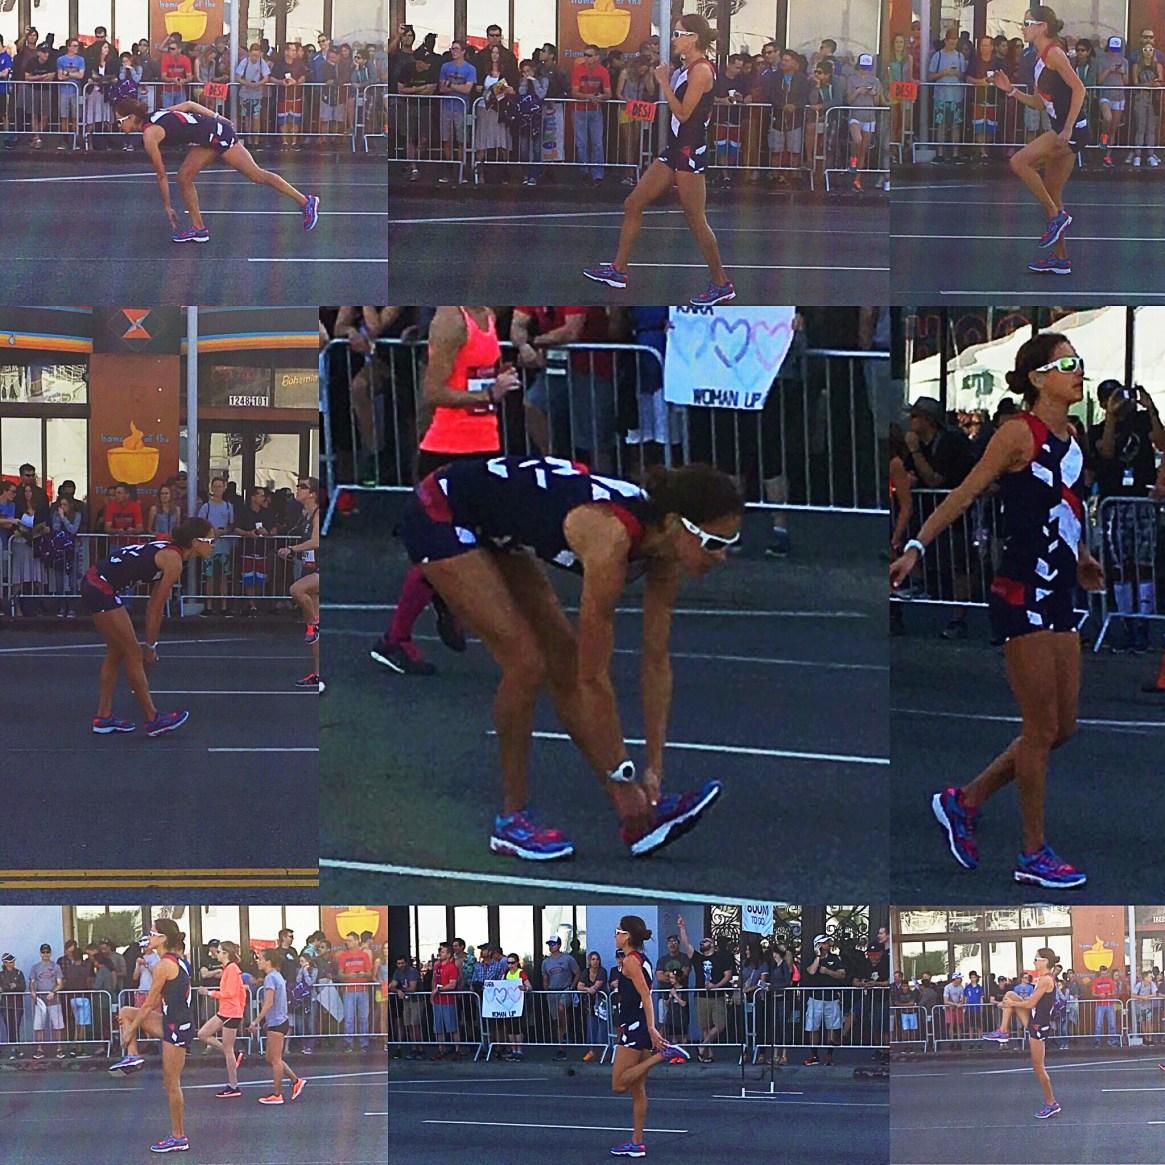 Kara Goucher, Olympic Trials, Marathon, LA2016